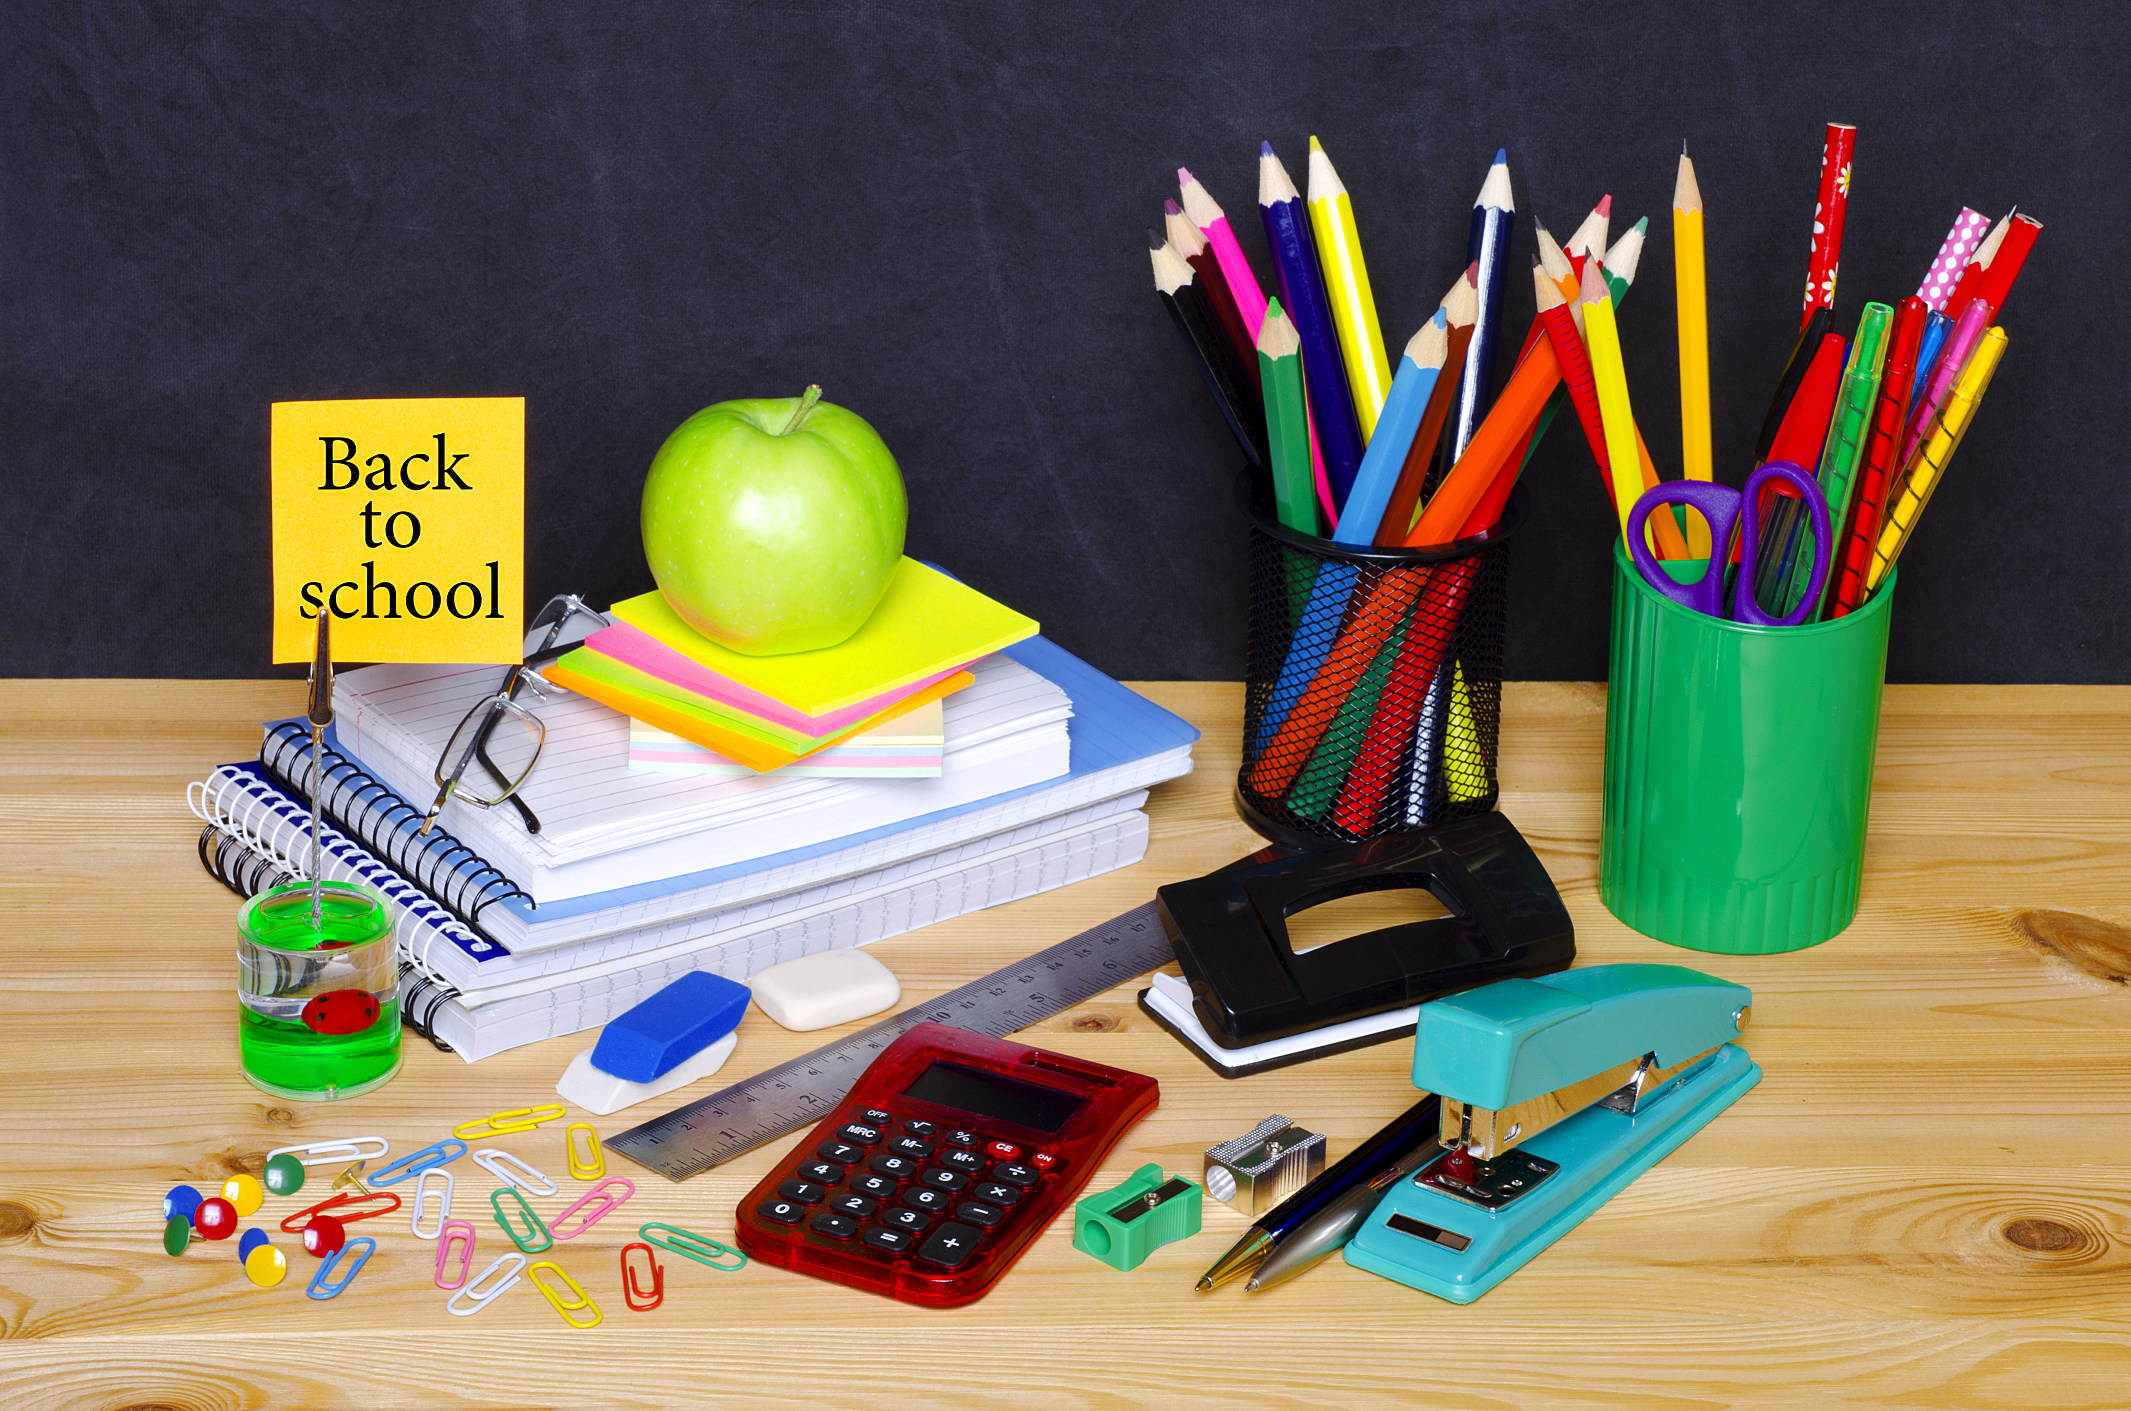 aisd school supply list 2020